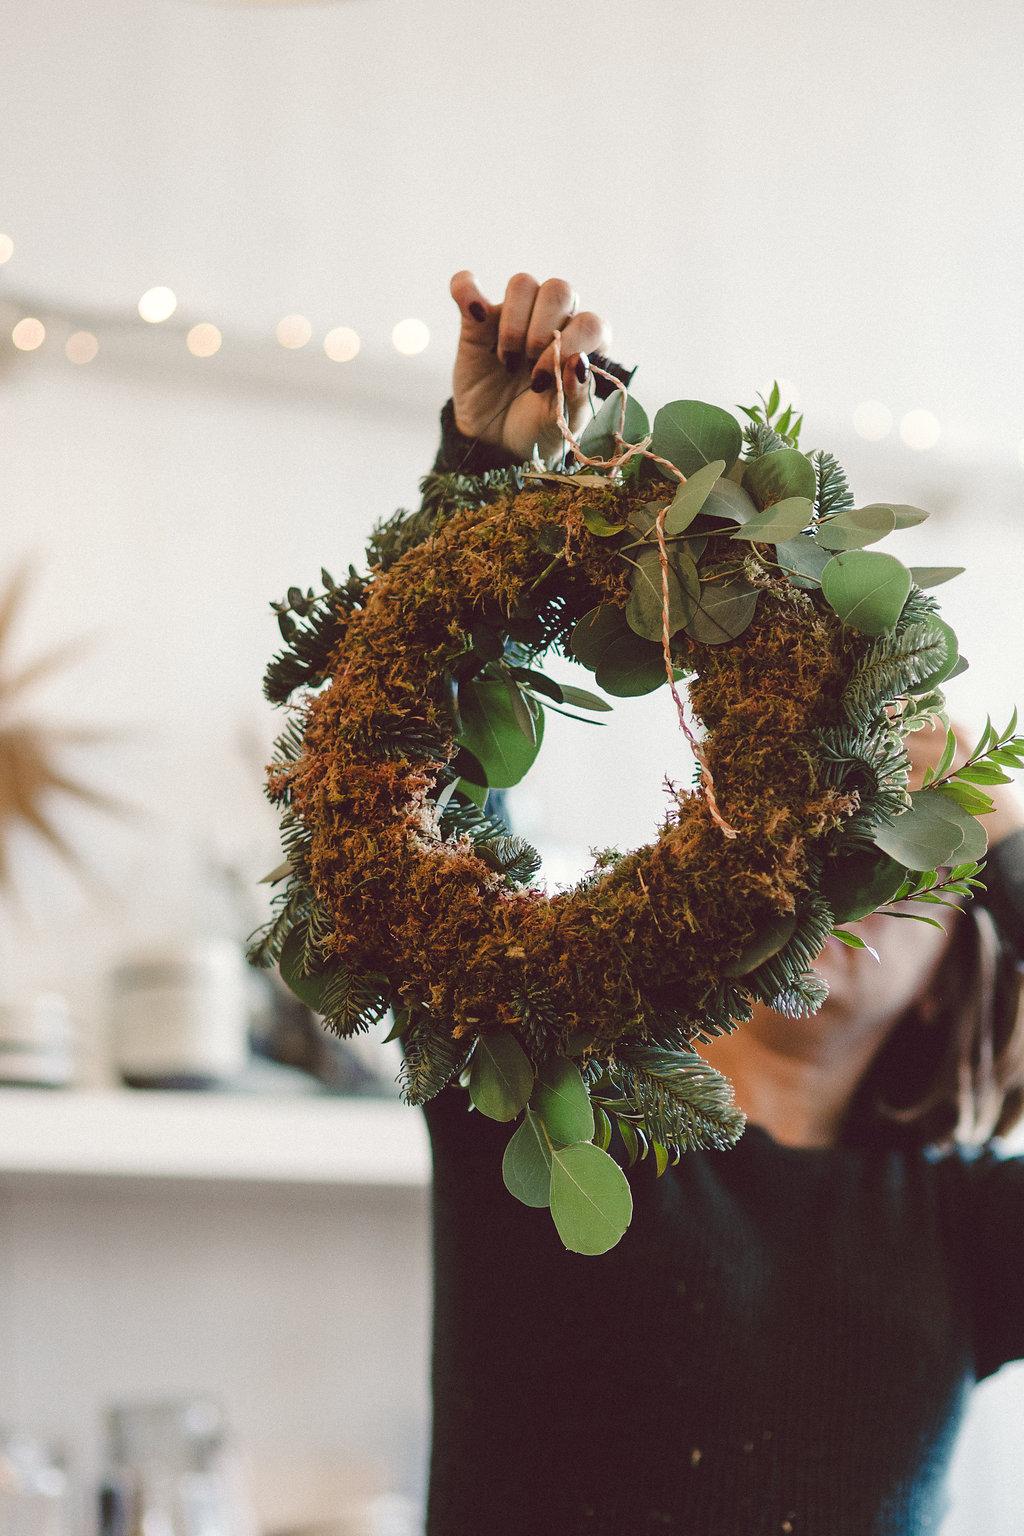 flower-workshop-wreath-making-the-good-florist-71.jpg